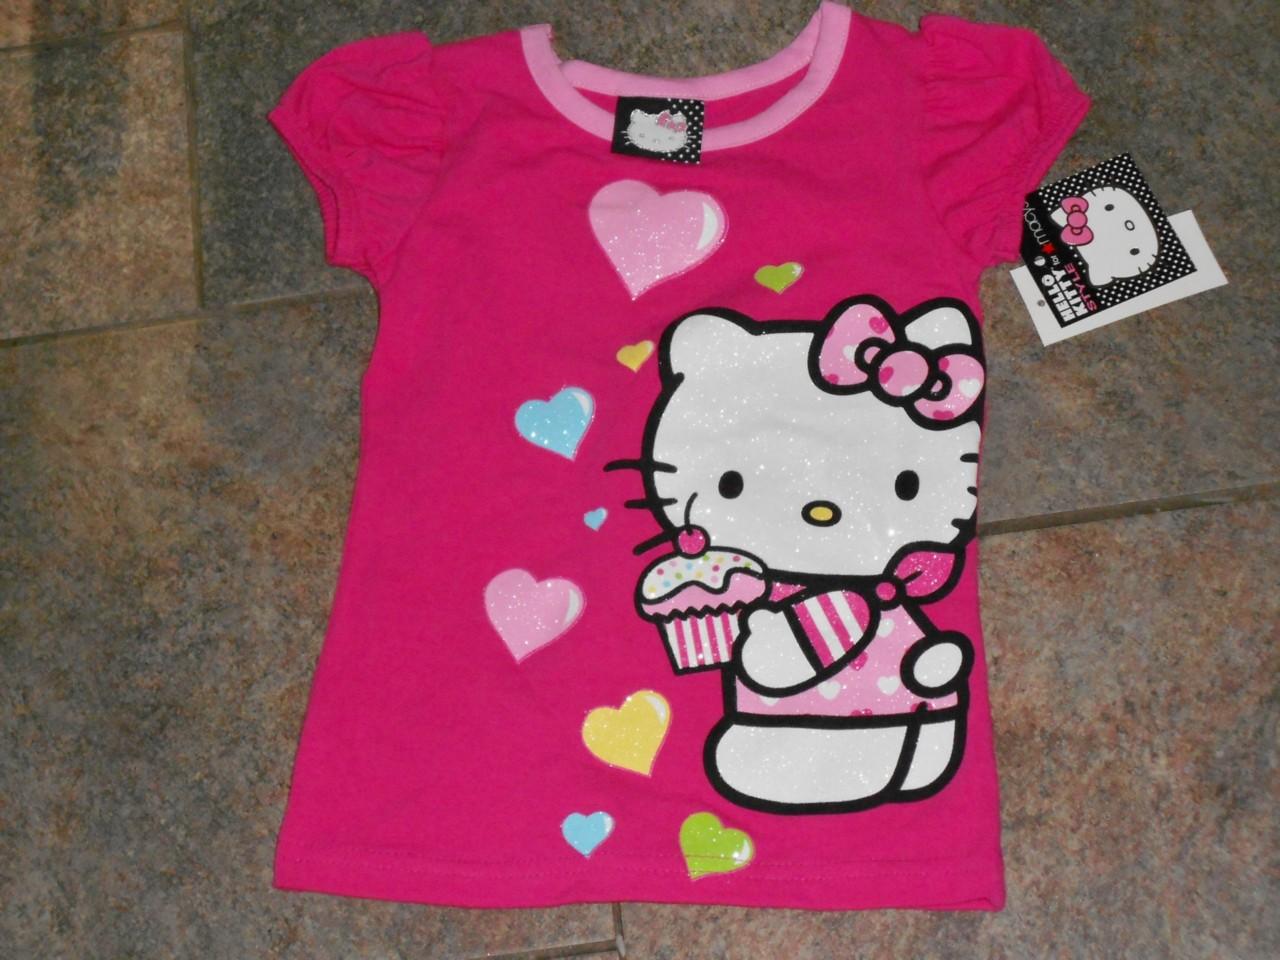 NWT Cupcake Heart Hello Kitty Pink Shirt top 4 5 6 6X